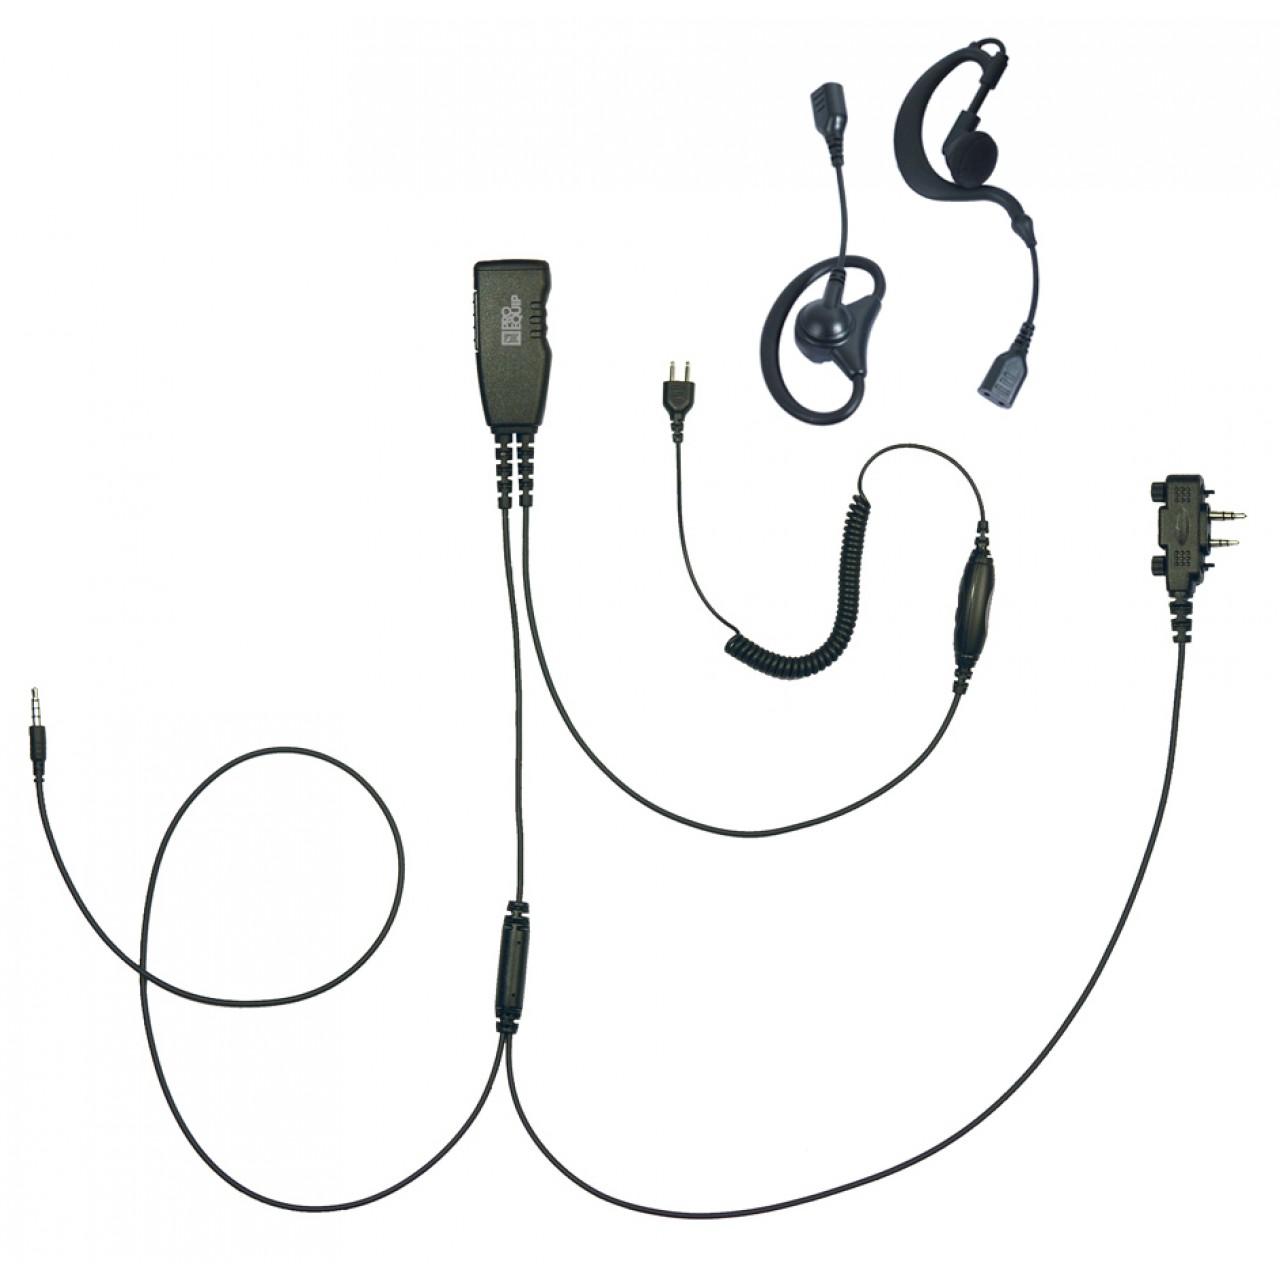 EP-SR29140 Headsets and earphones - ICOM